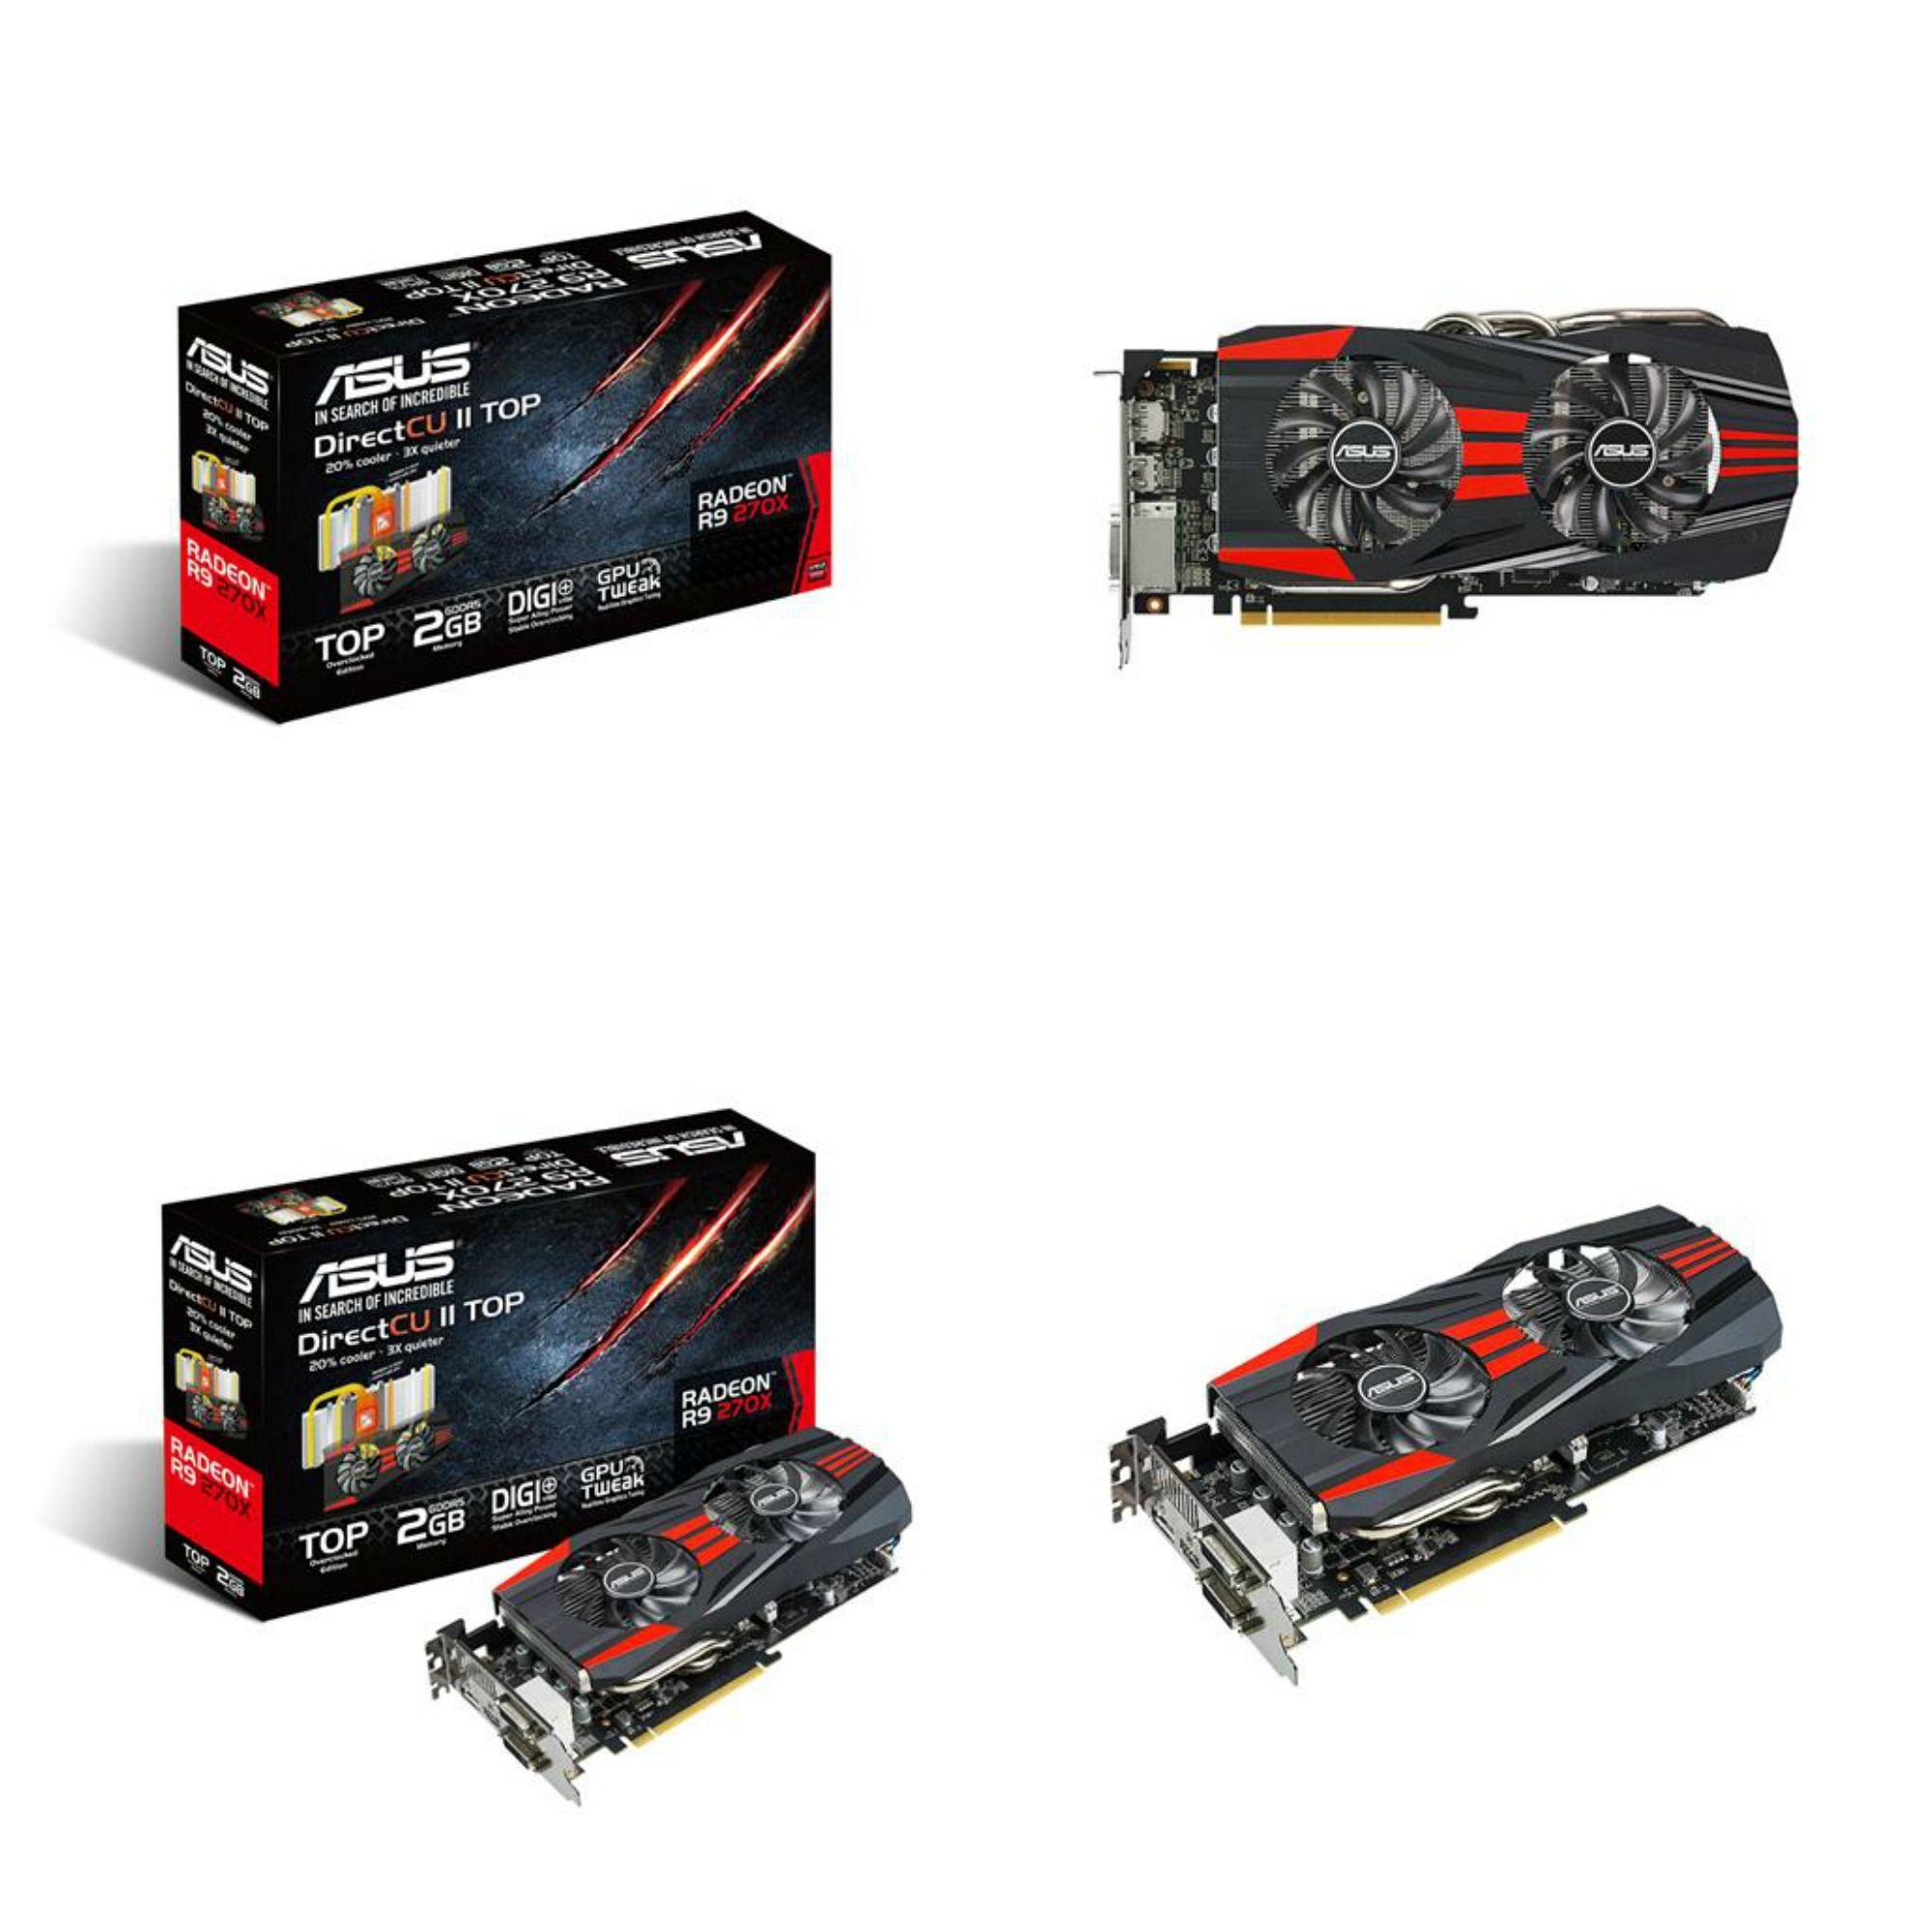 ASUS Radeon R9 270X | Computers